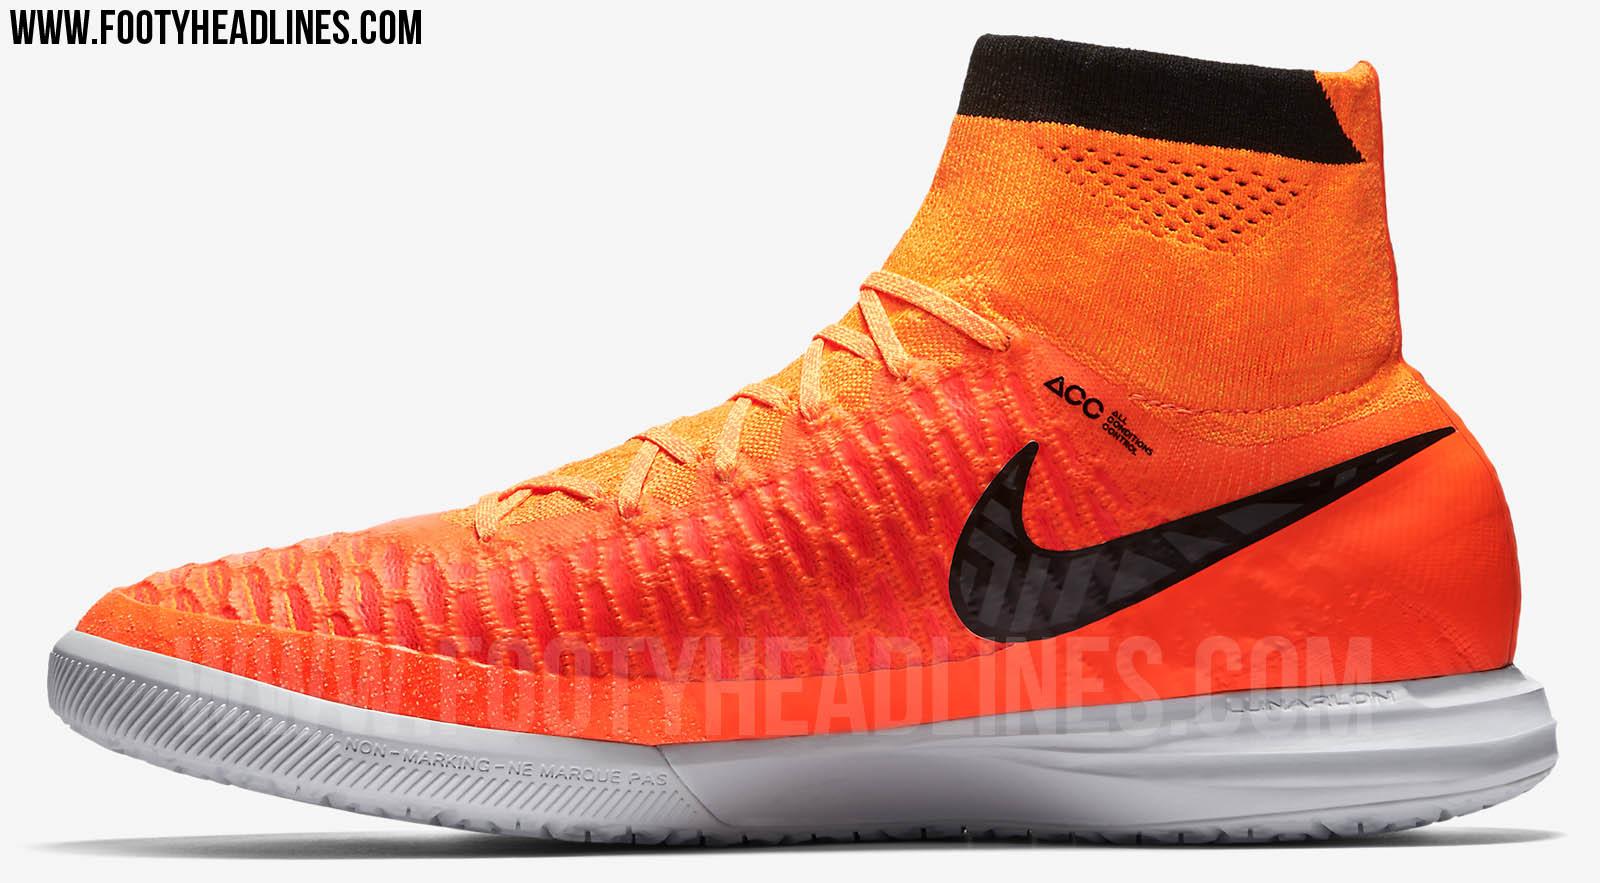 Orange Nike Magista X Proximo Boots Released - Footy Headlines